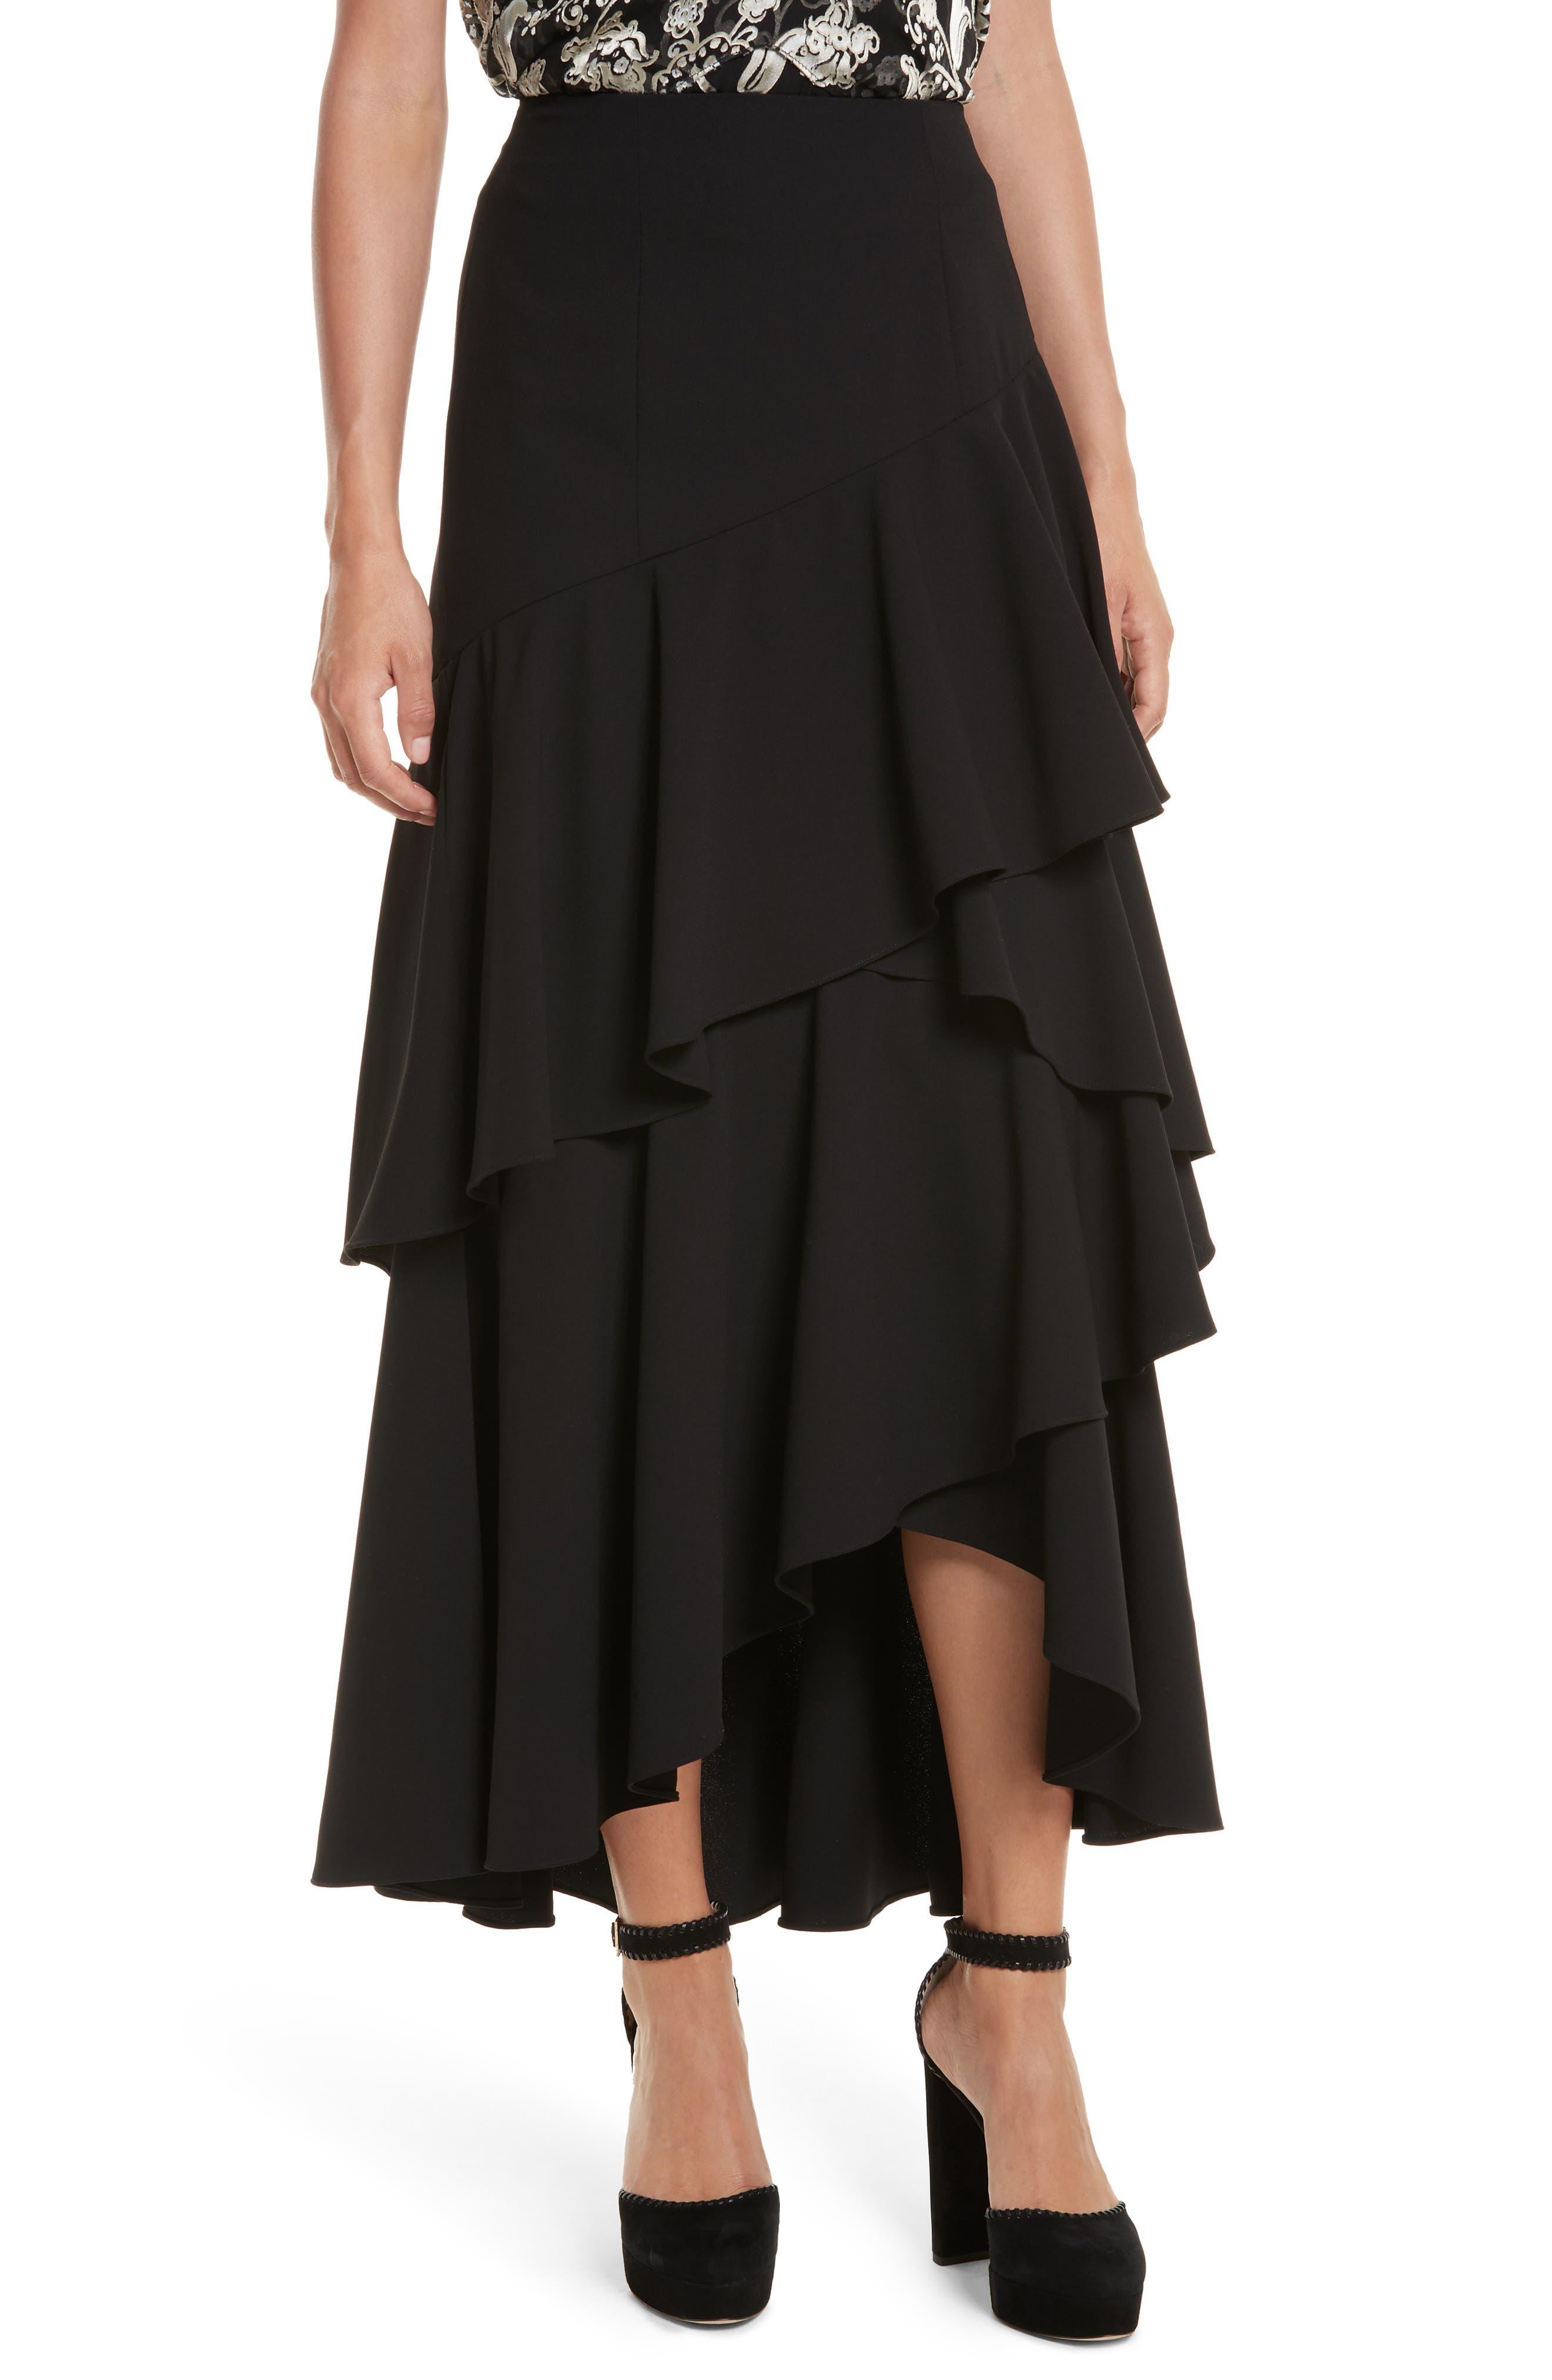 Alice + Olivia Martina High/Low Ruffle Skirt